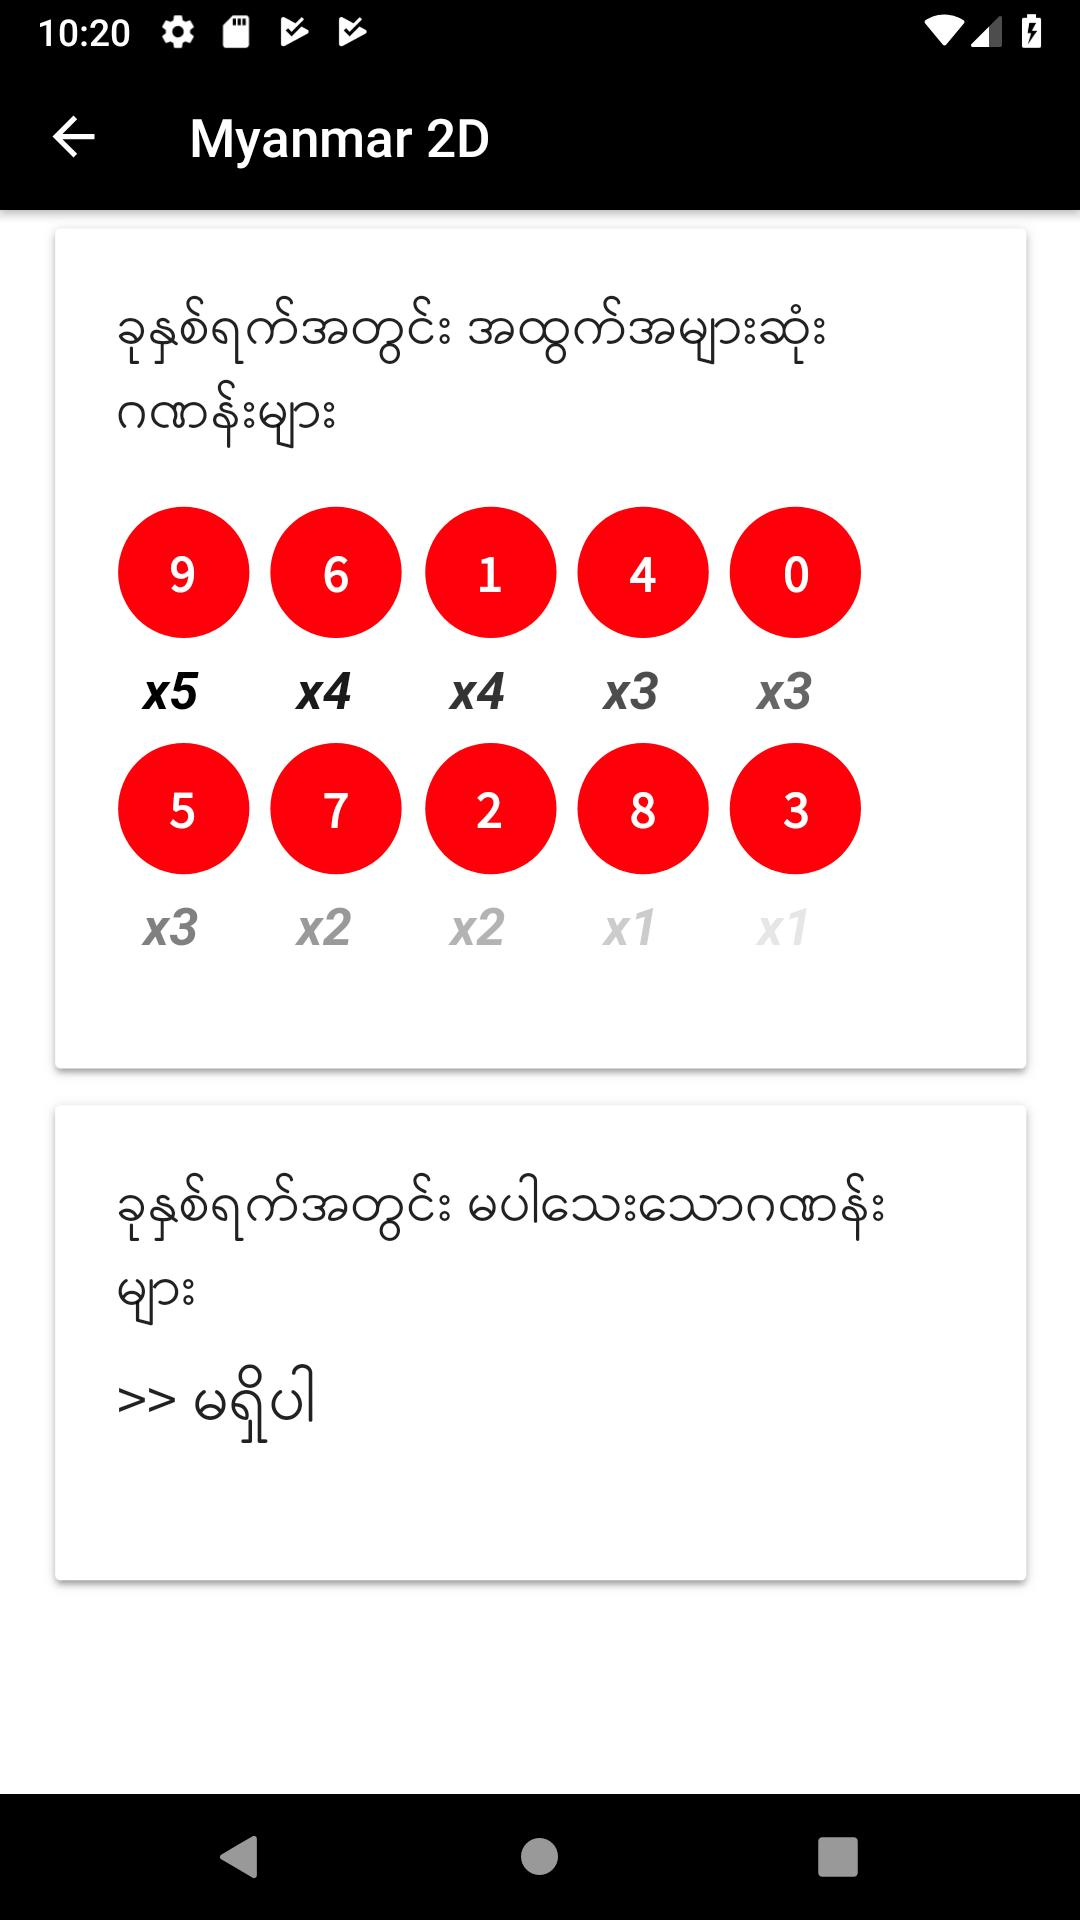 Myanmar 2D/3D Live Update - MMDroidUser 1.3.02 Screenshot 5